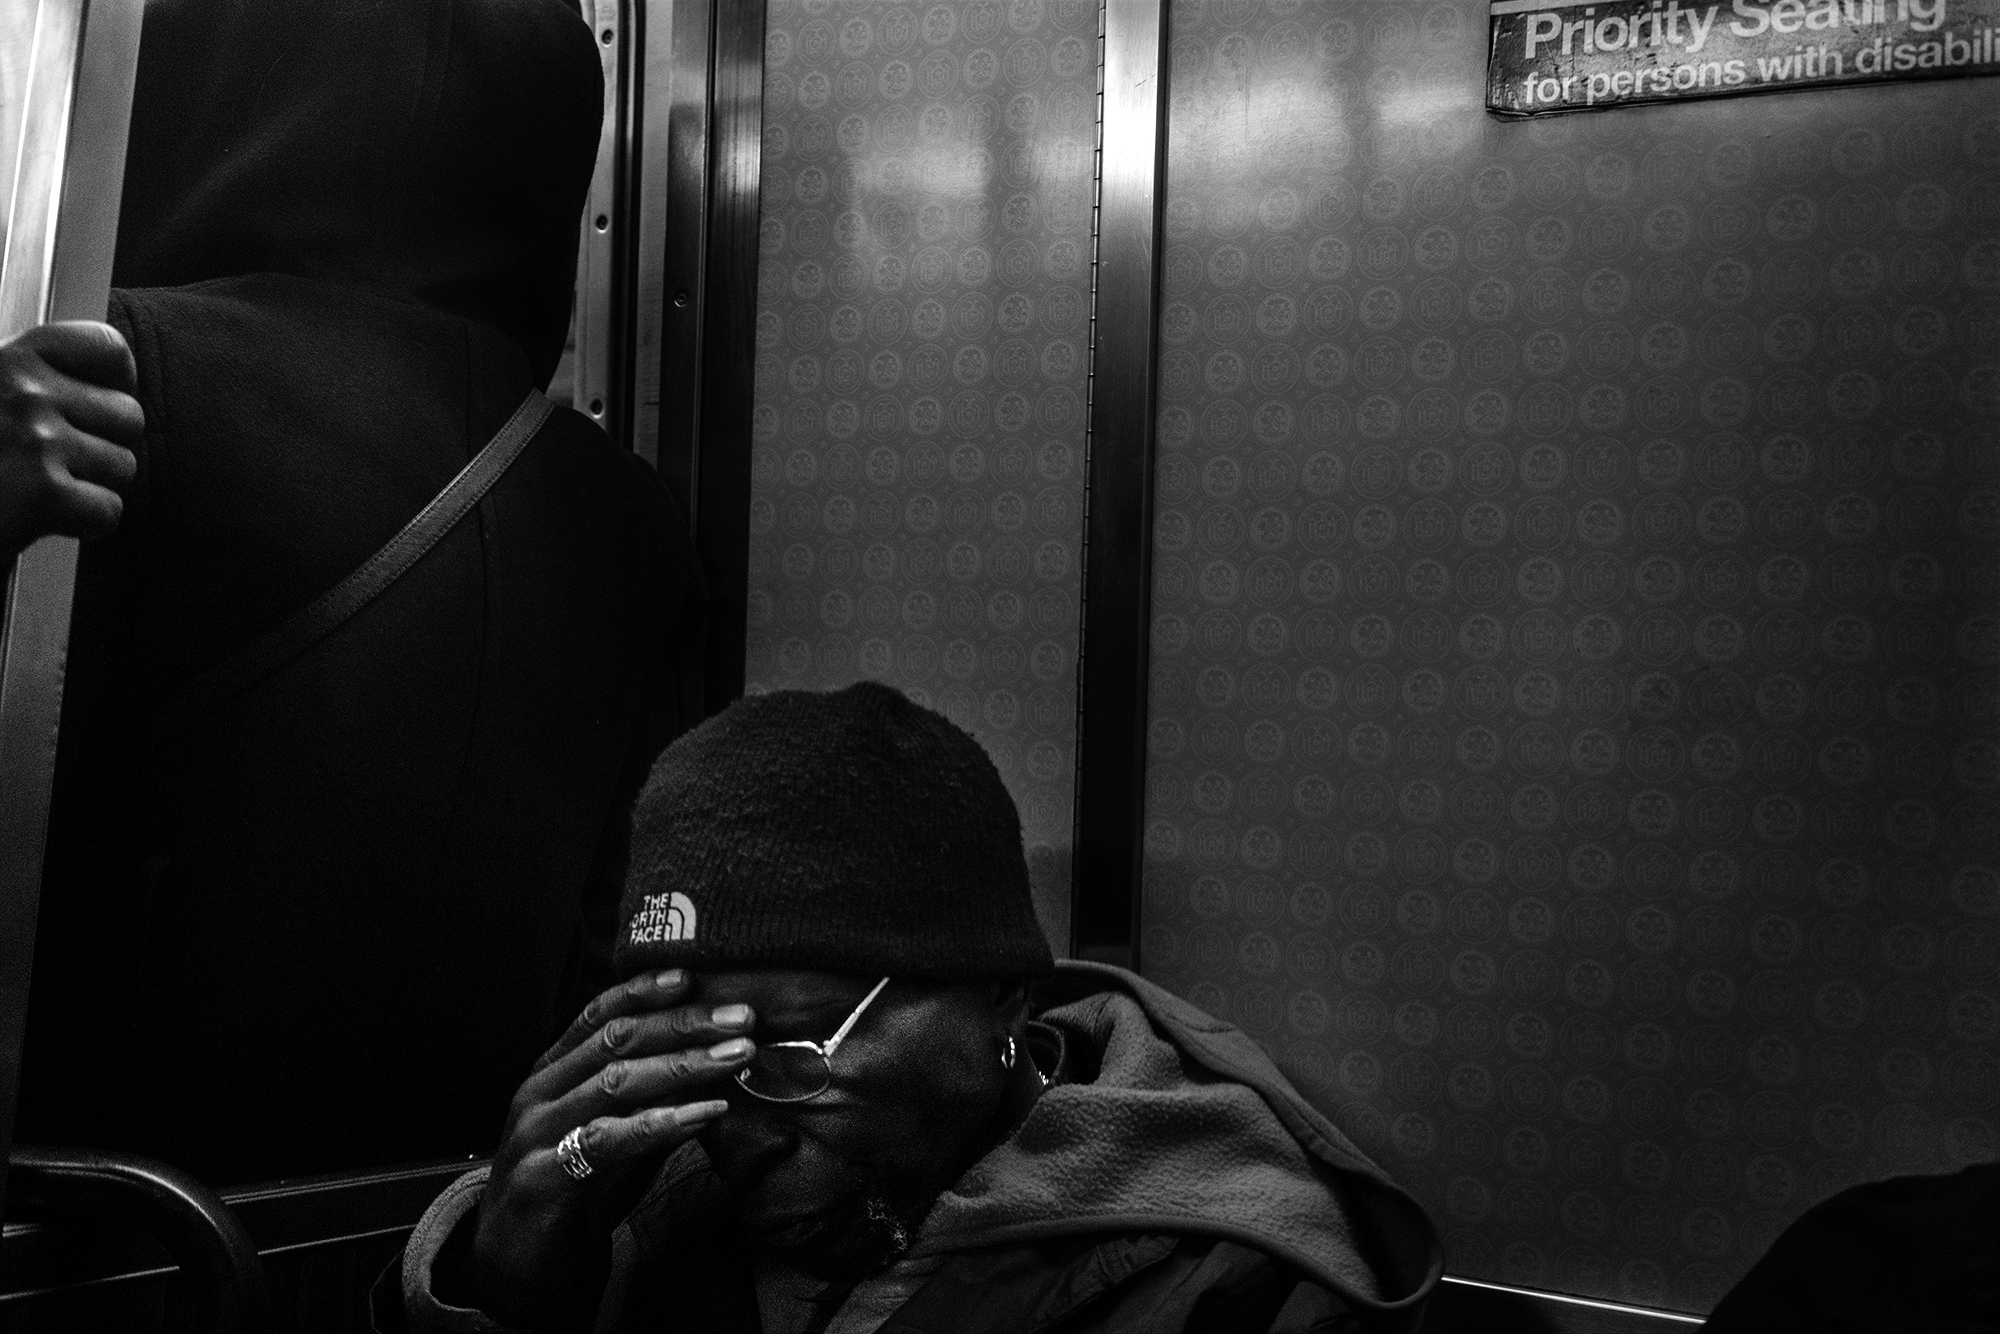 Brklyn_Subway_2017_Headache_Man-001.jpg